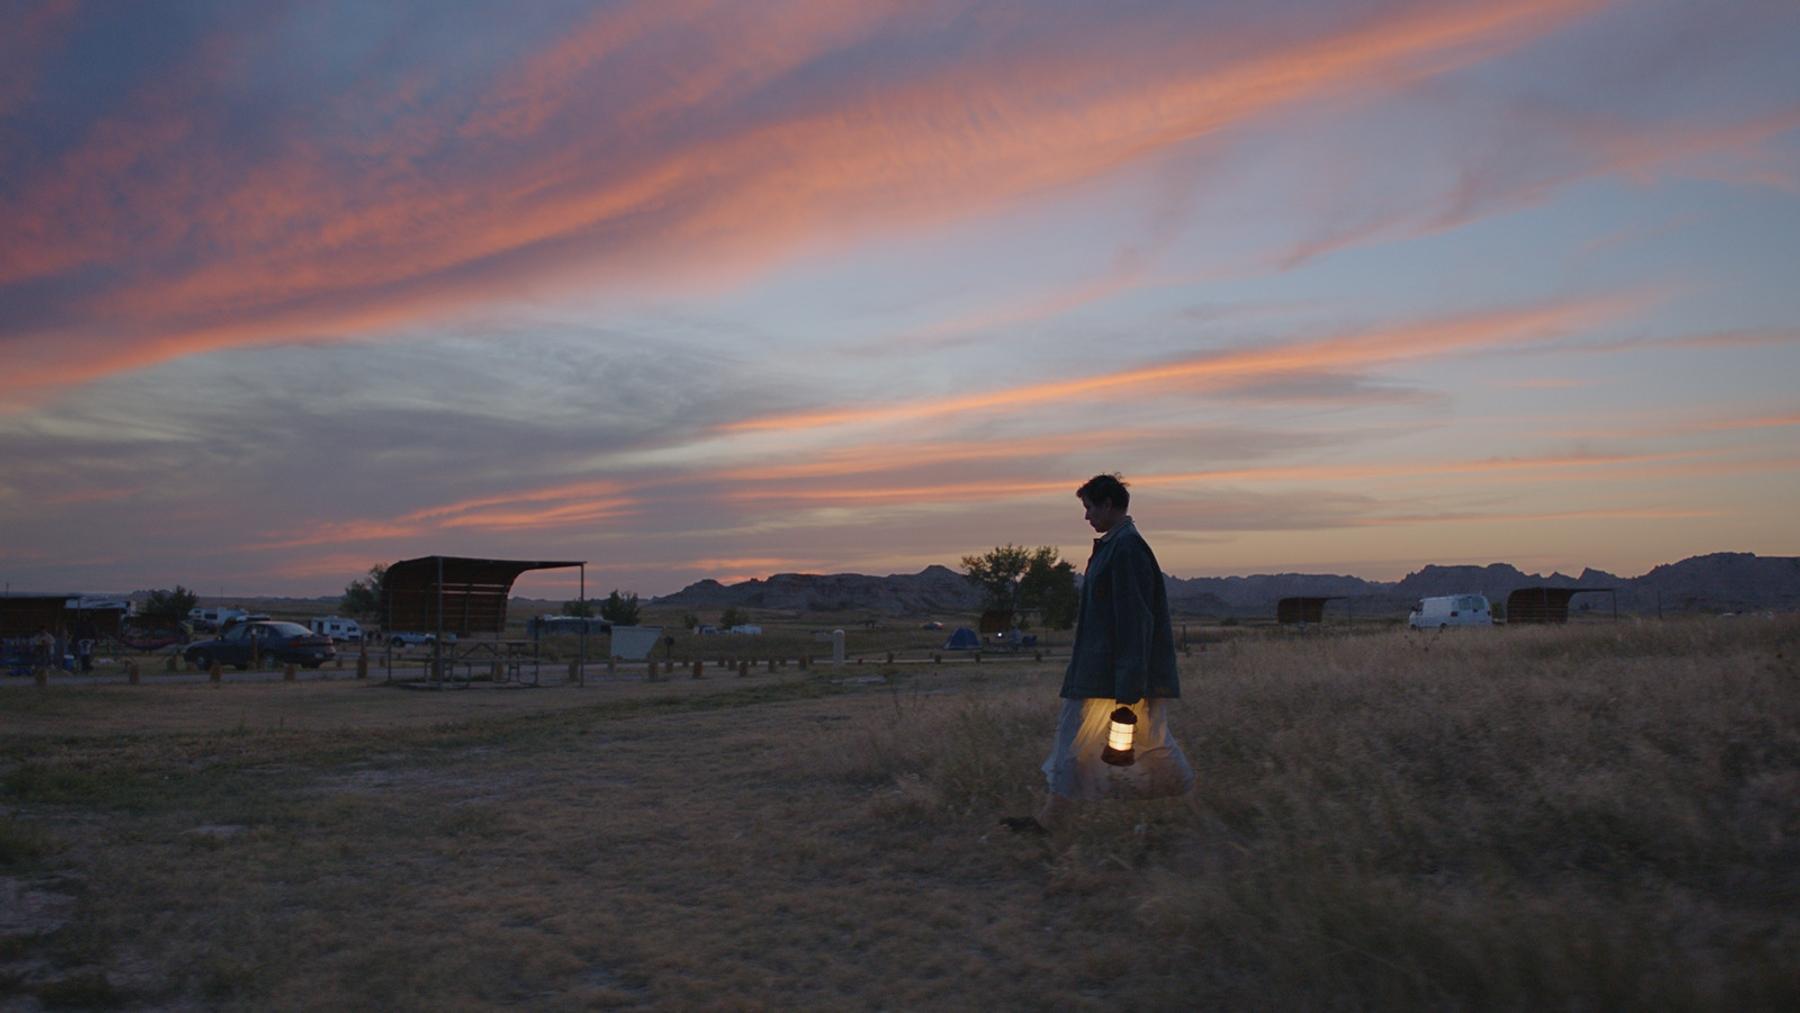 2021 docu-fiction film Nomadland was filmed in Arizona, Nevada and South Dakota